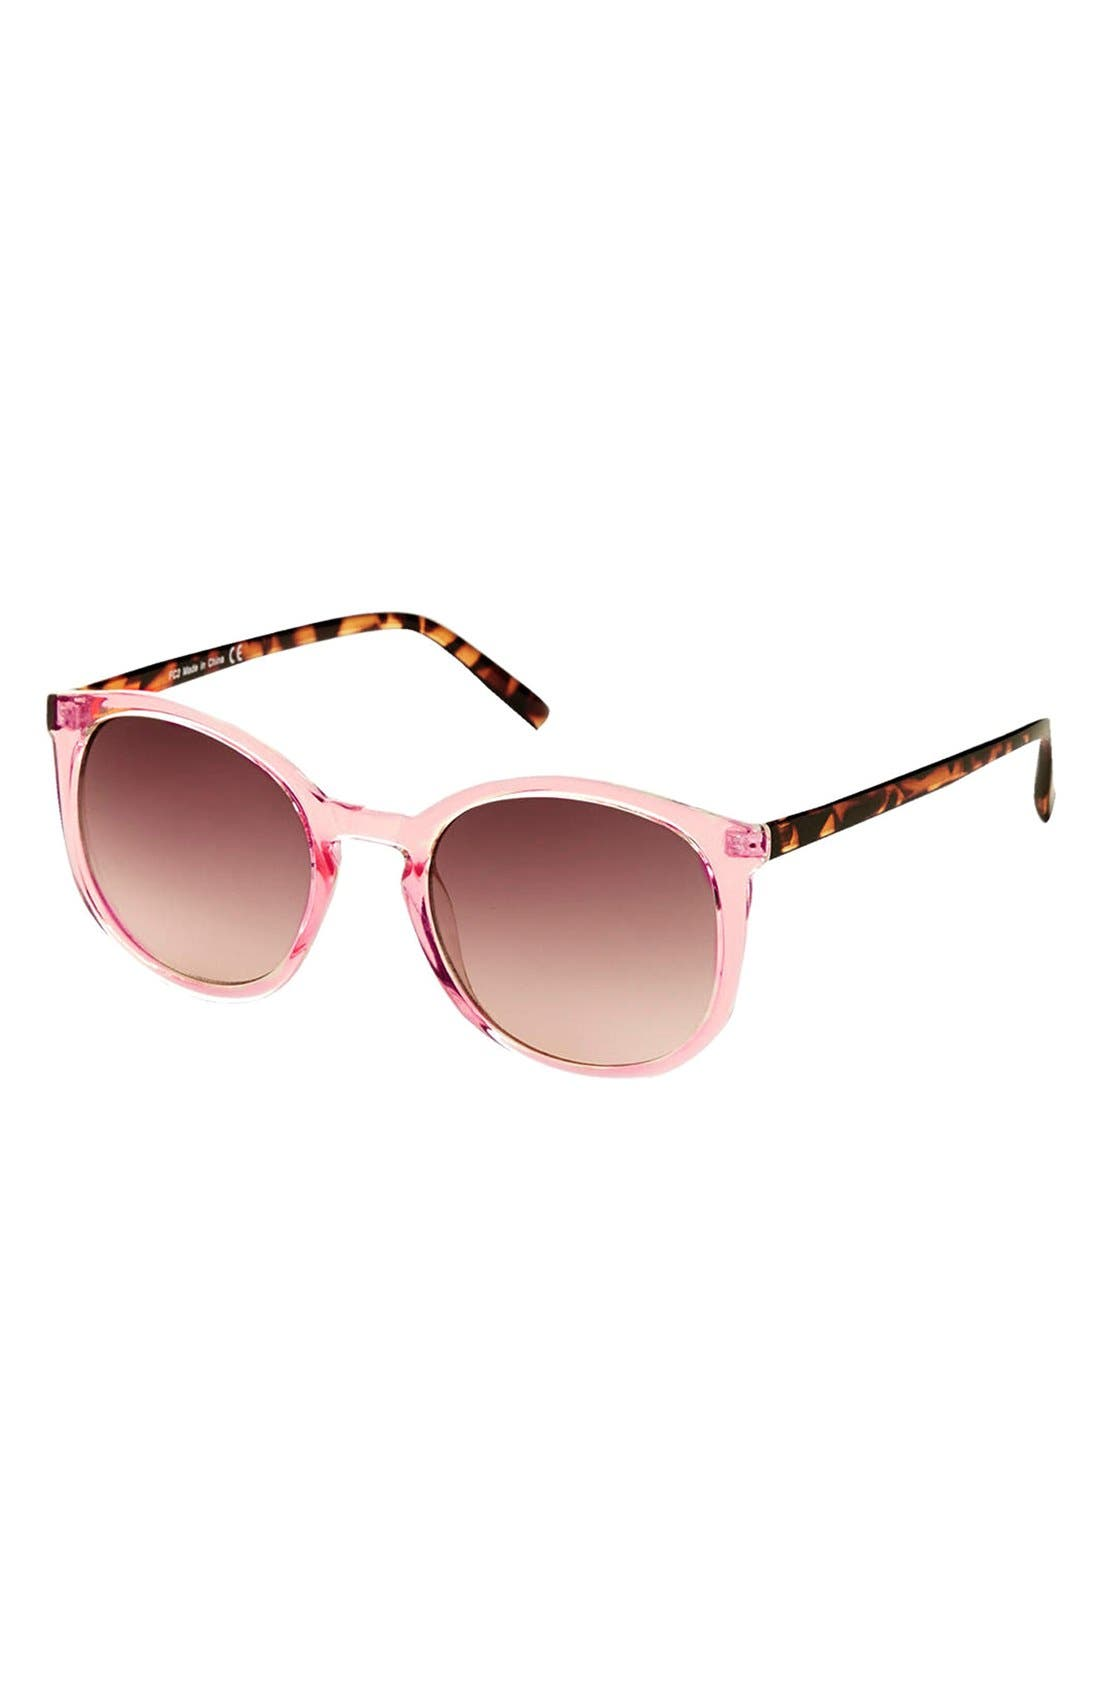 Main Image - Topshop 50mm Round Sunglasses